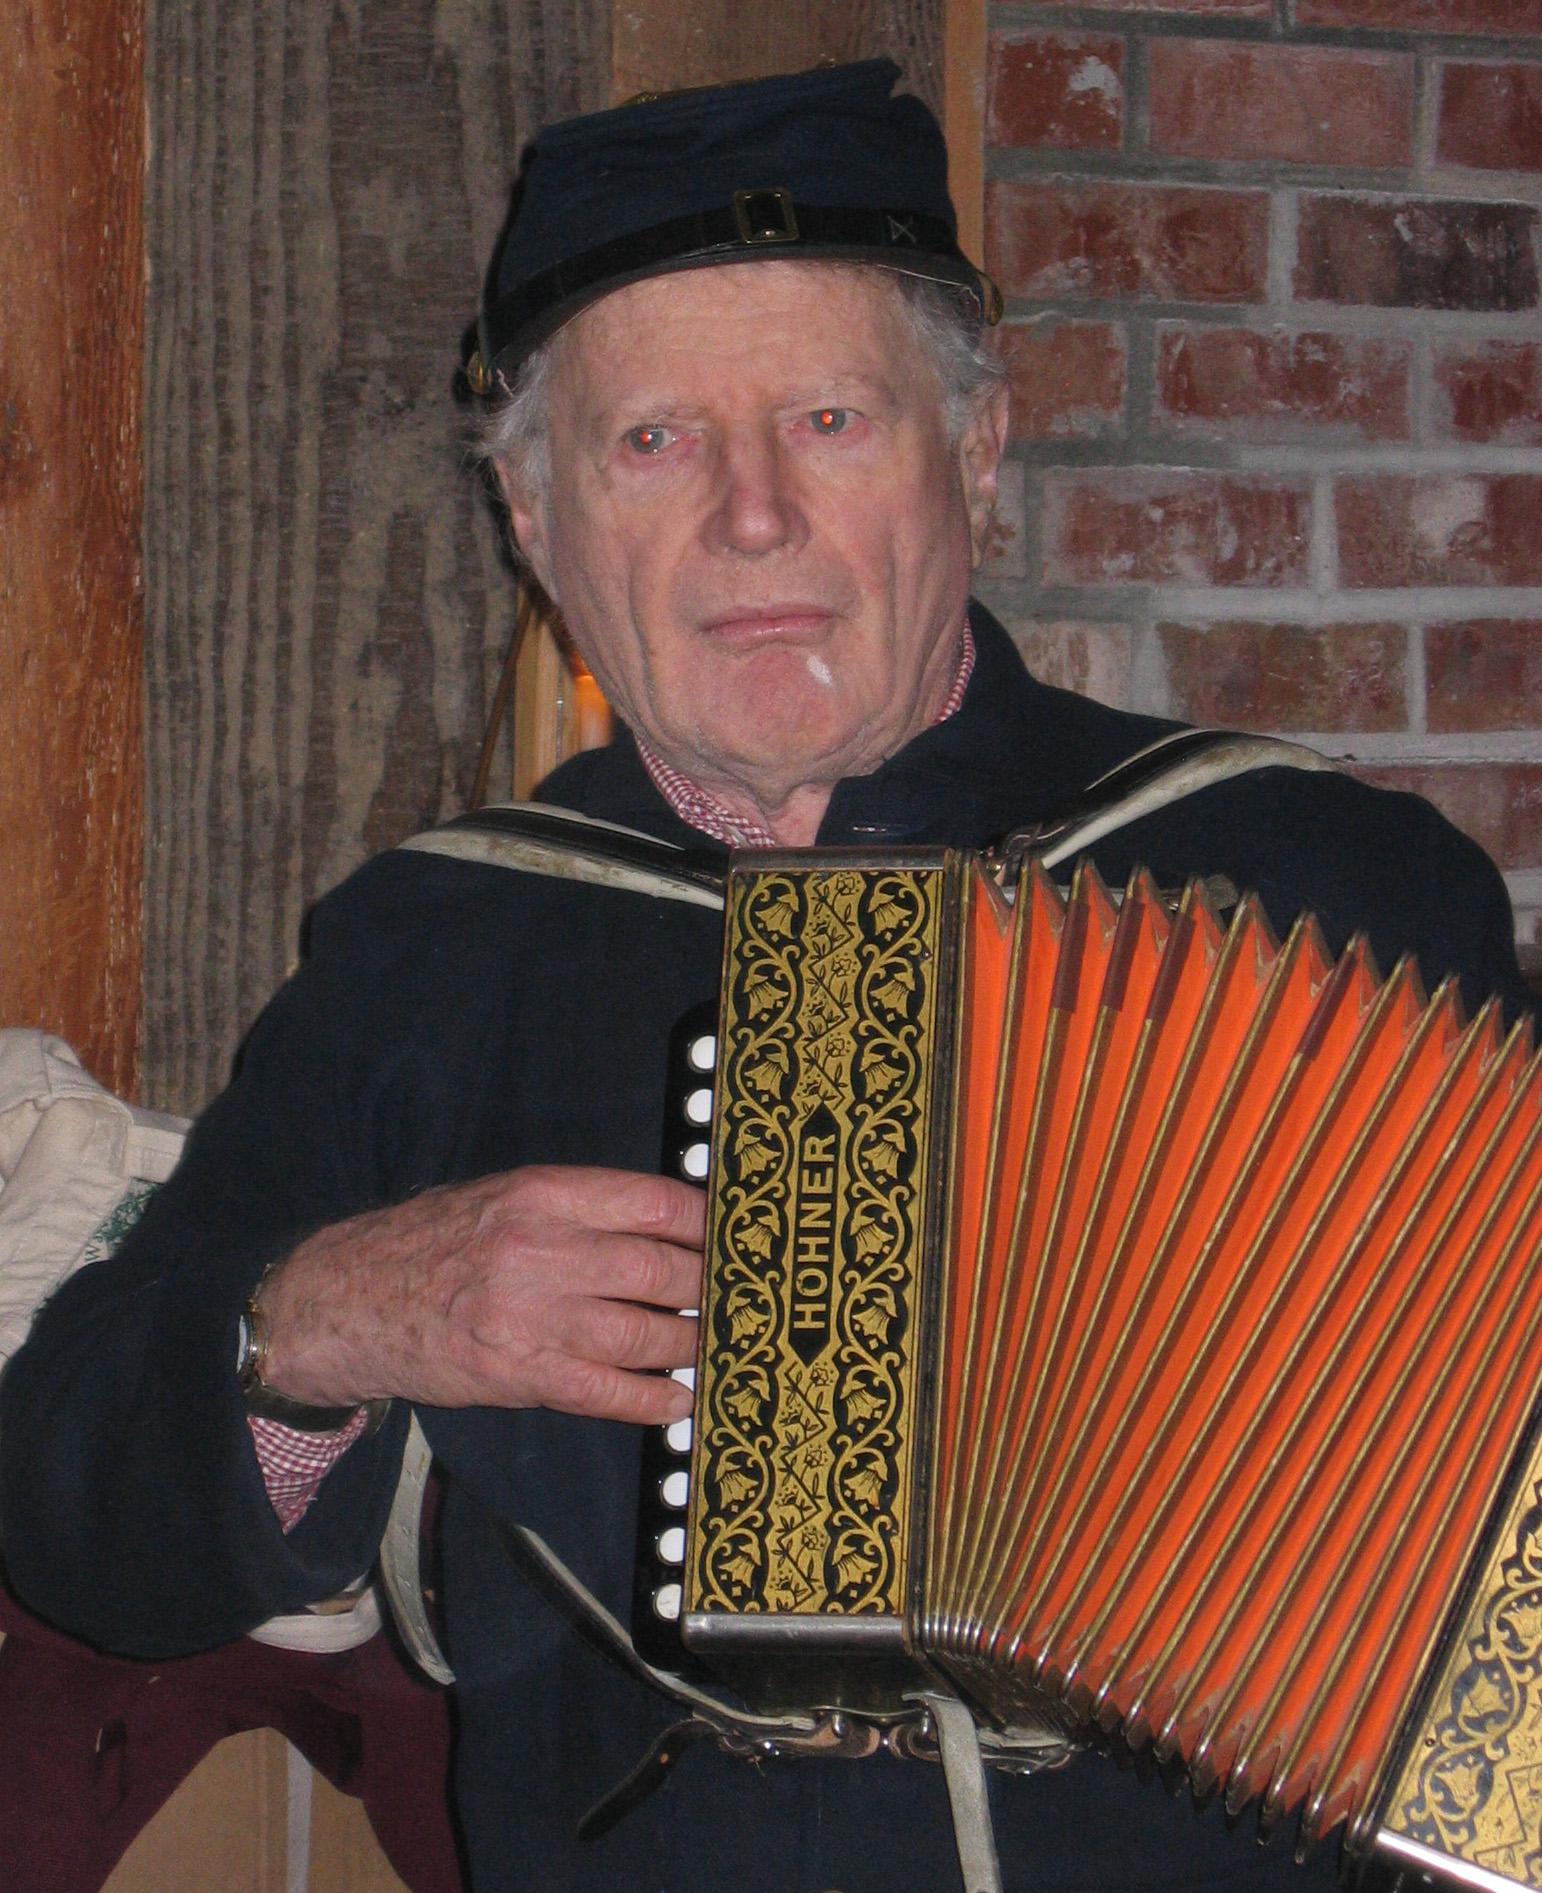 folk music master